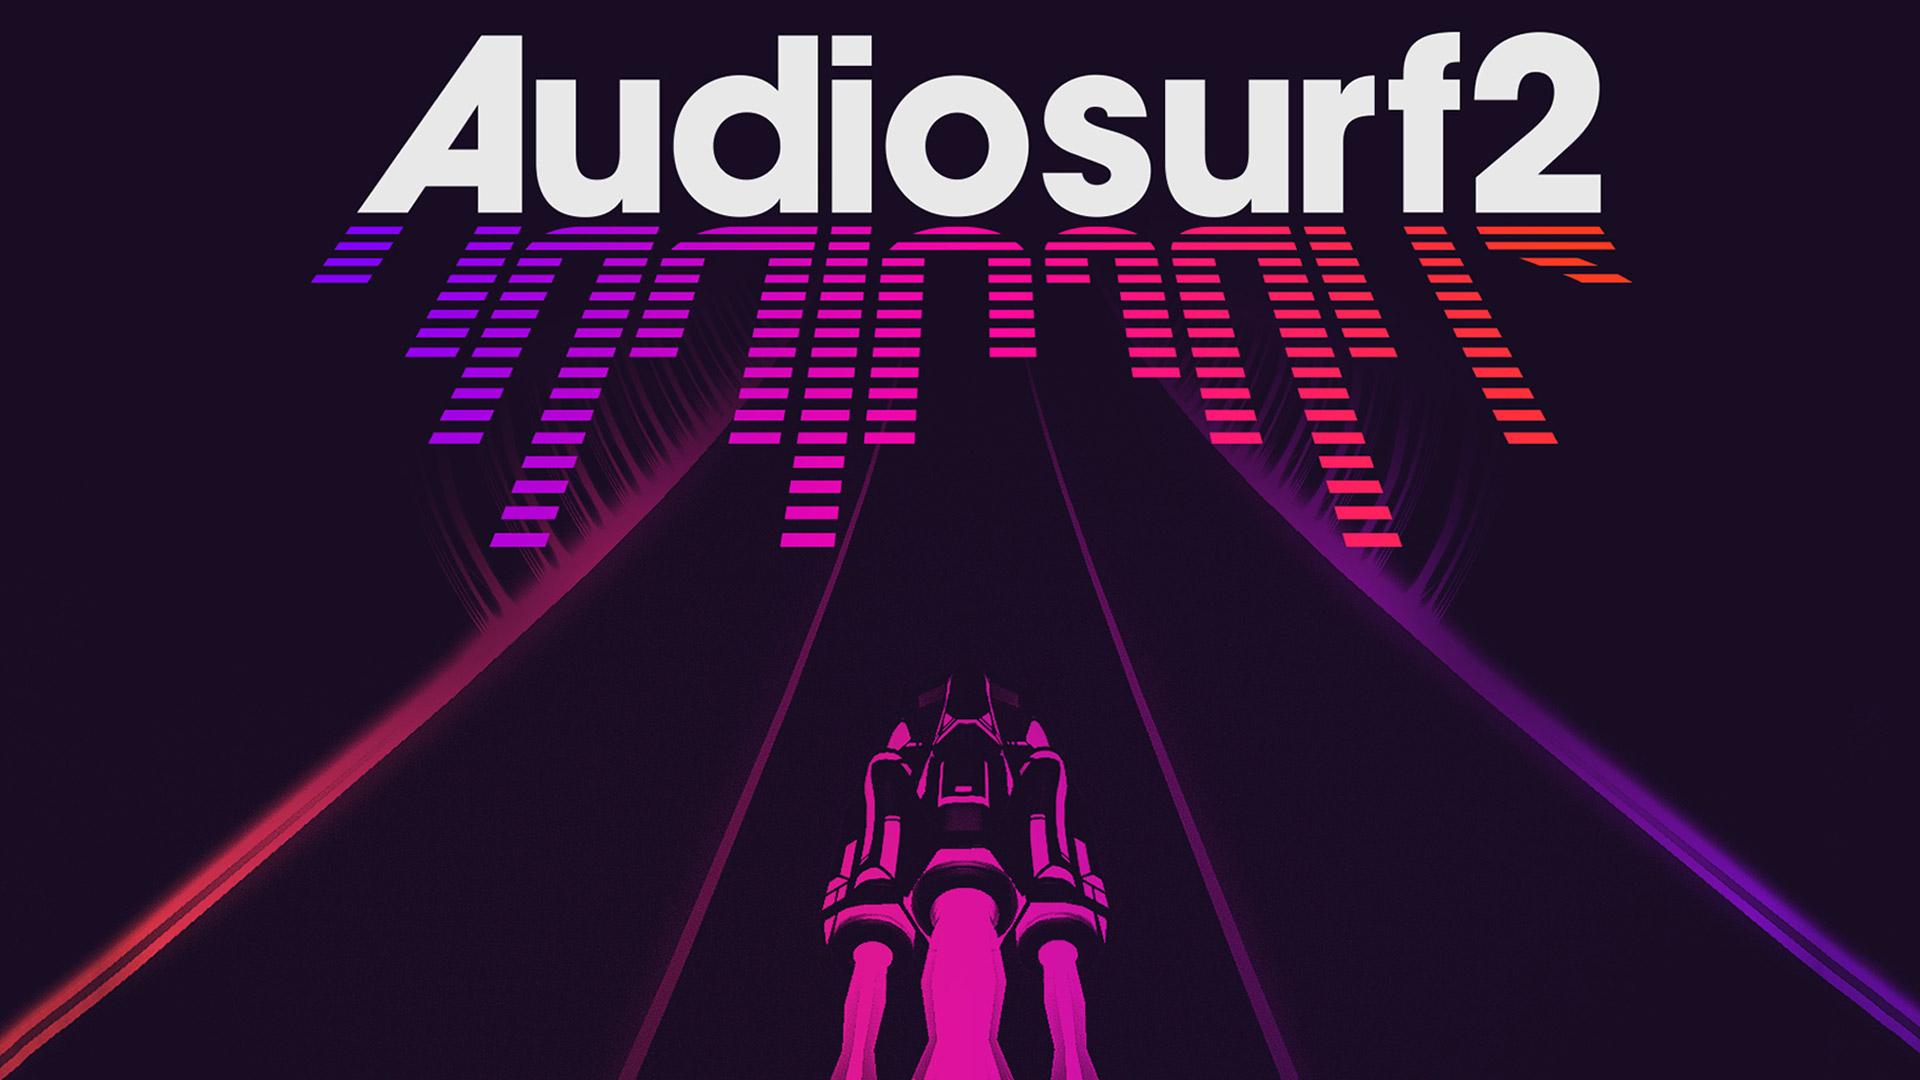 Free Audiosurf 2 Wallpaper in 1920x1080